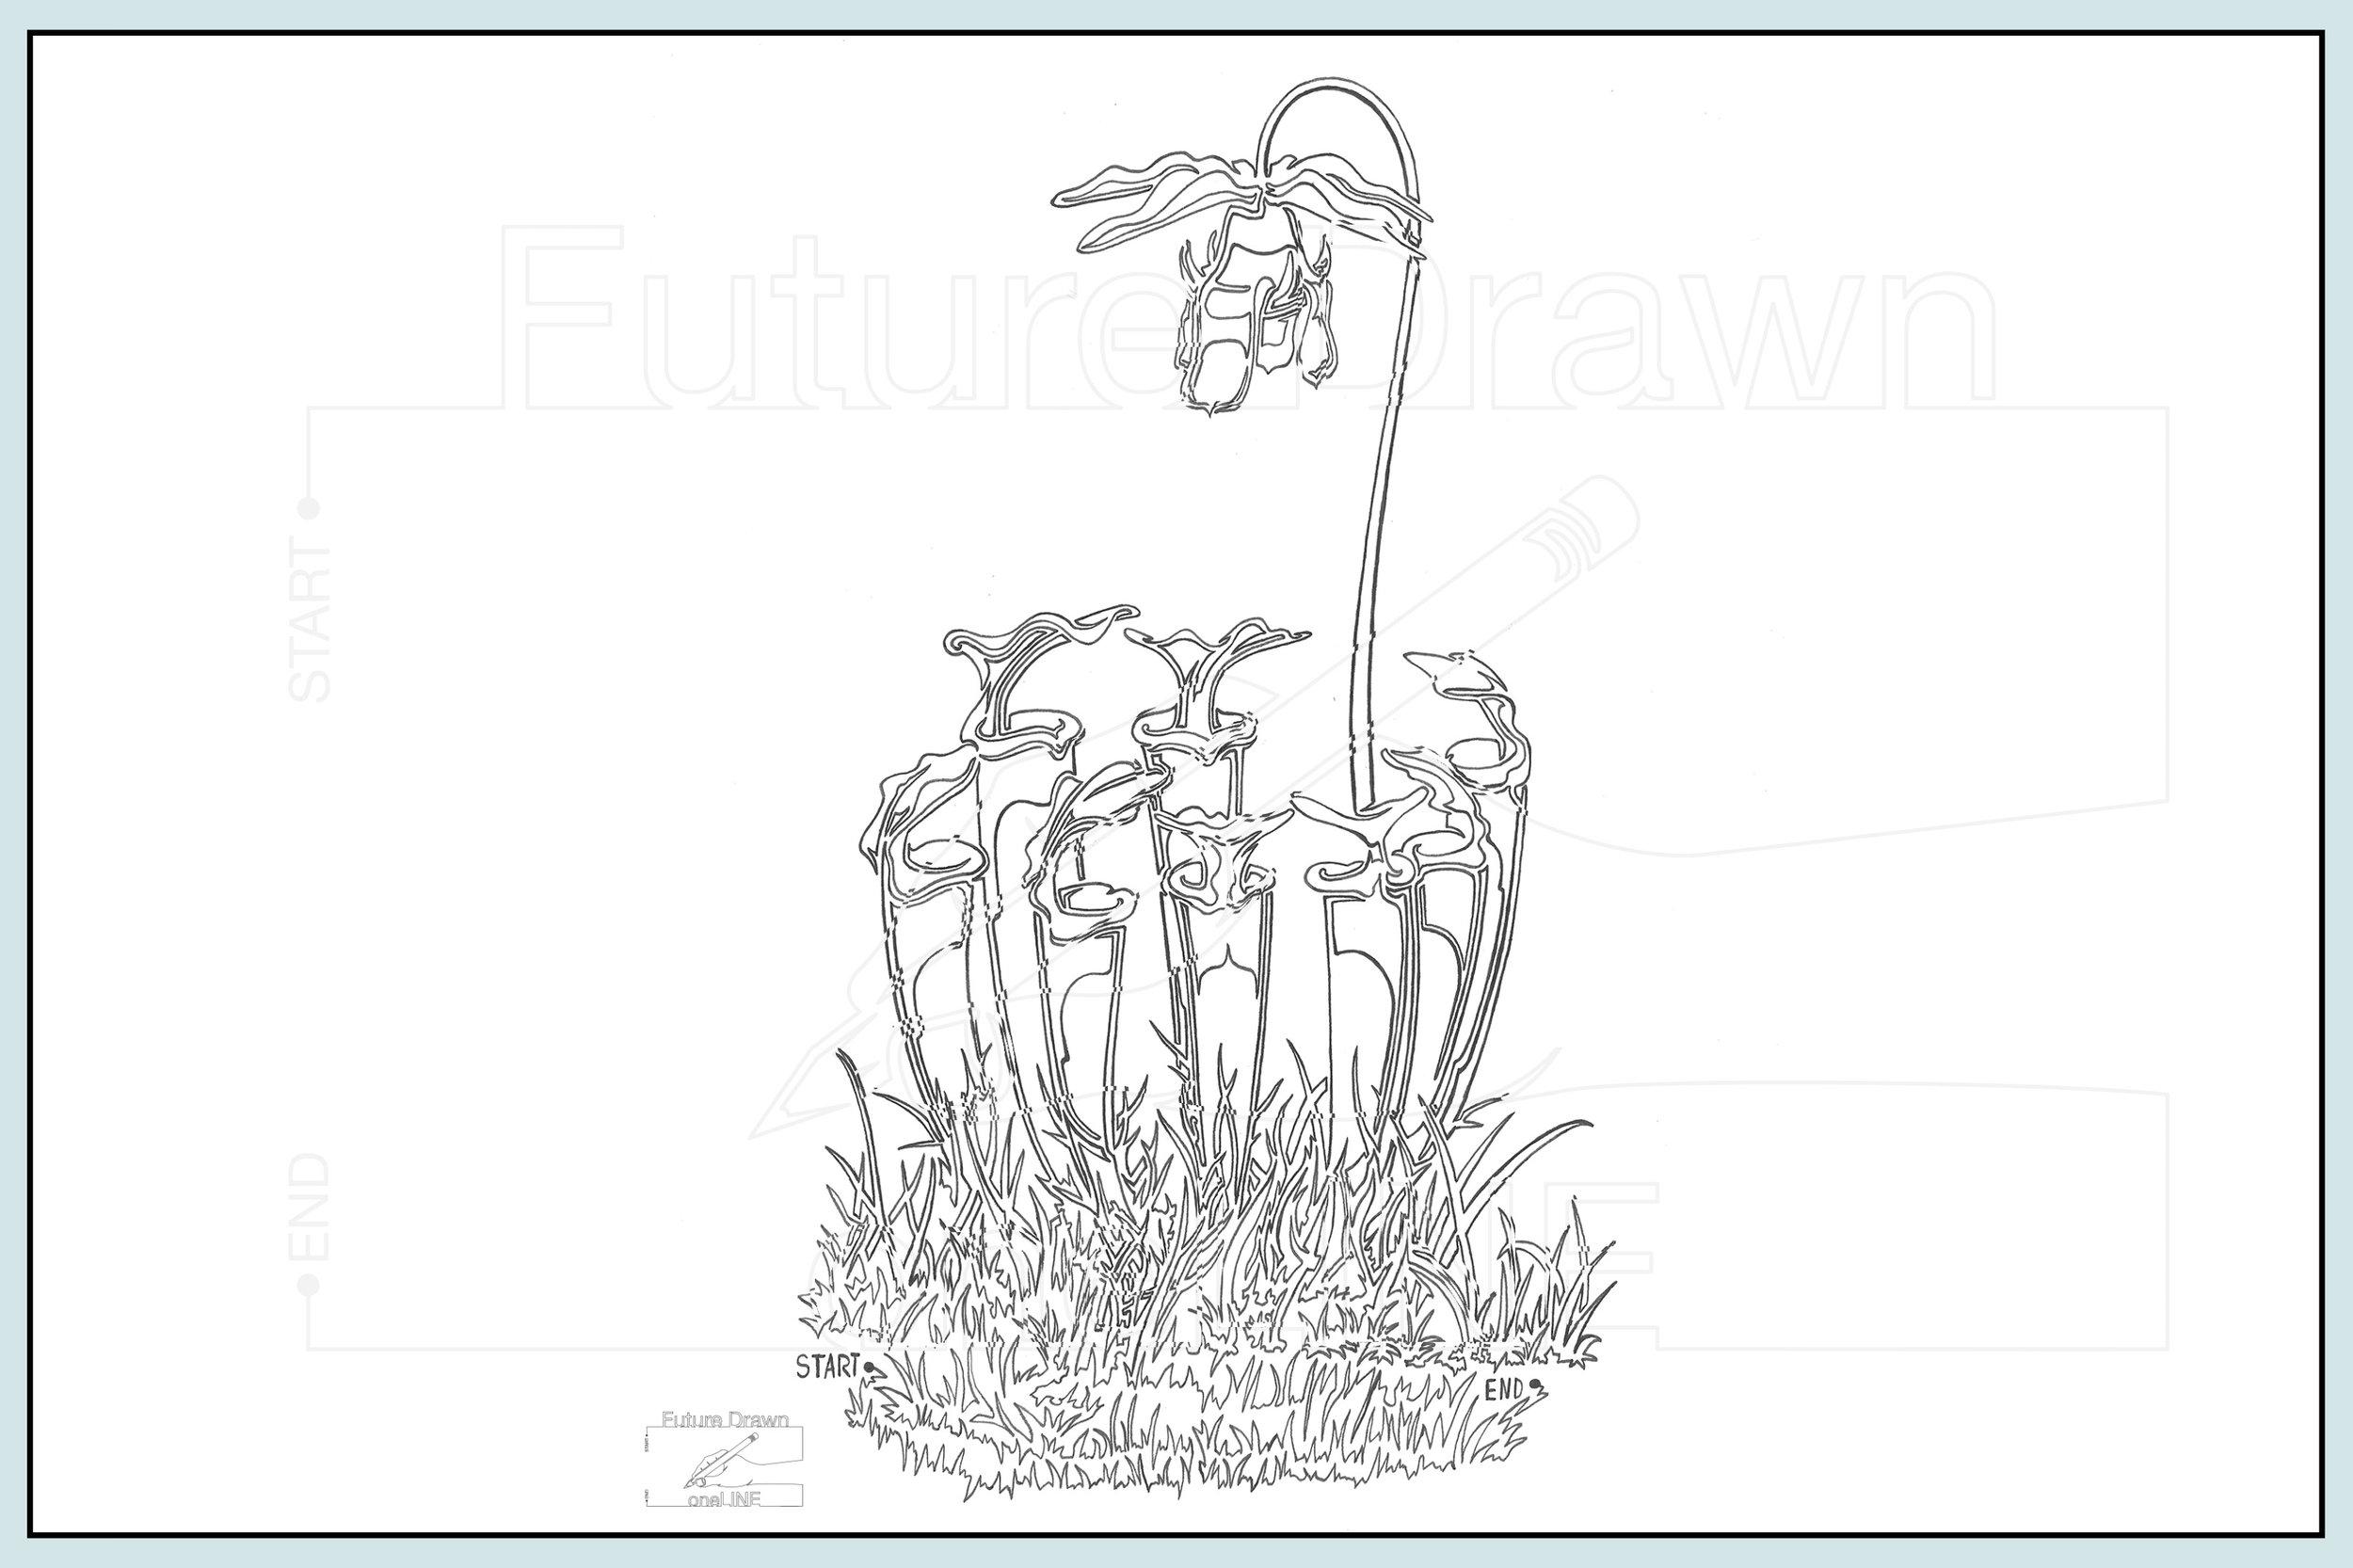 Web- Sarracenia oneLINE botanical- oneLINE Future Drawn Applegate.jpg